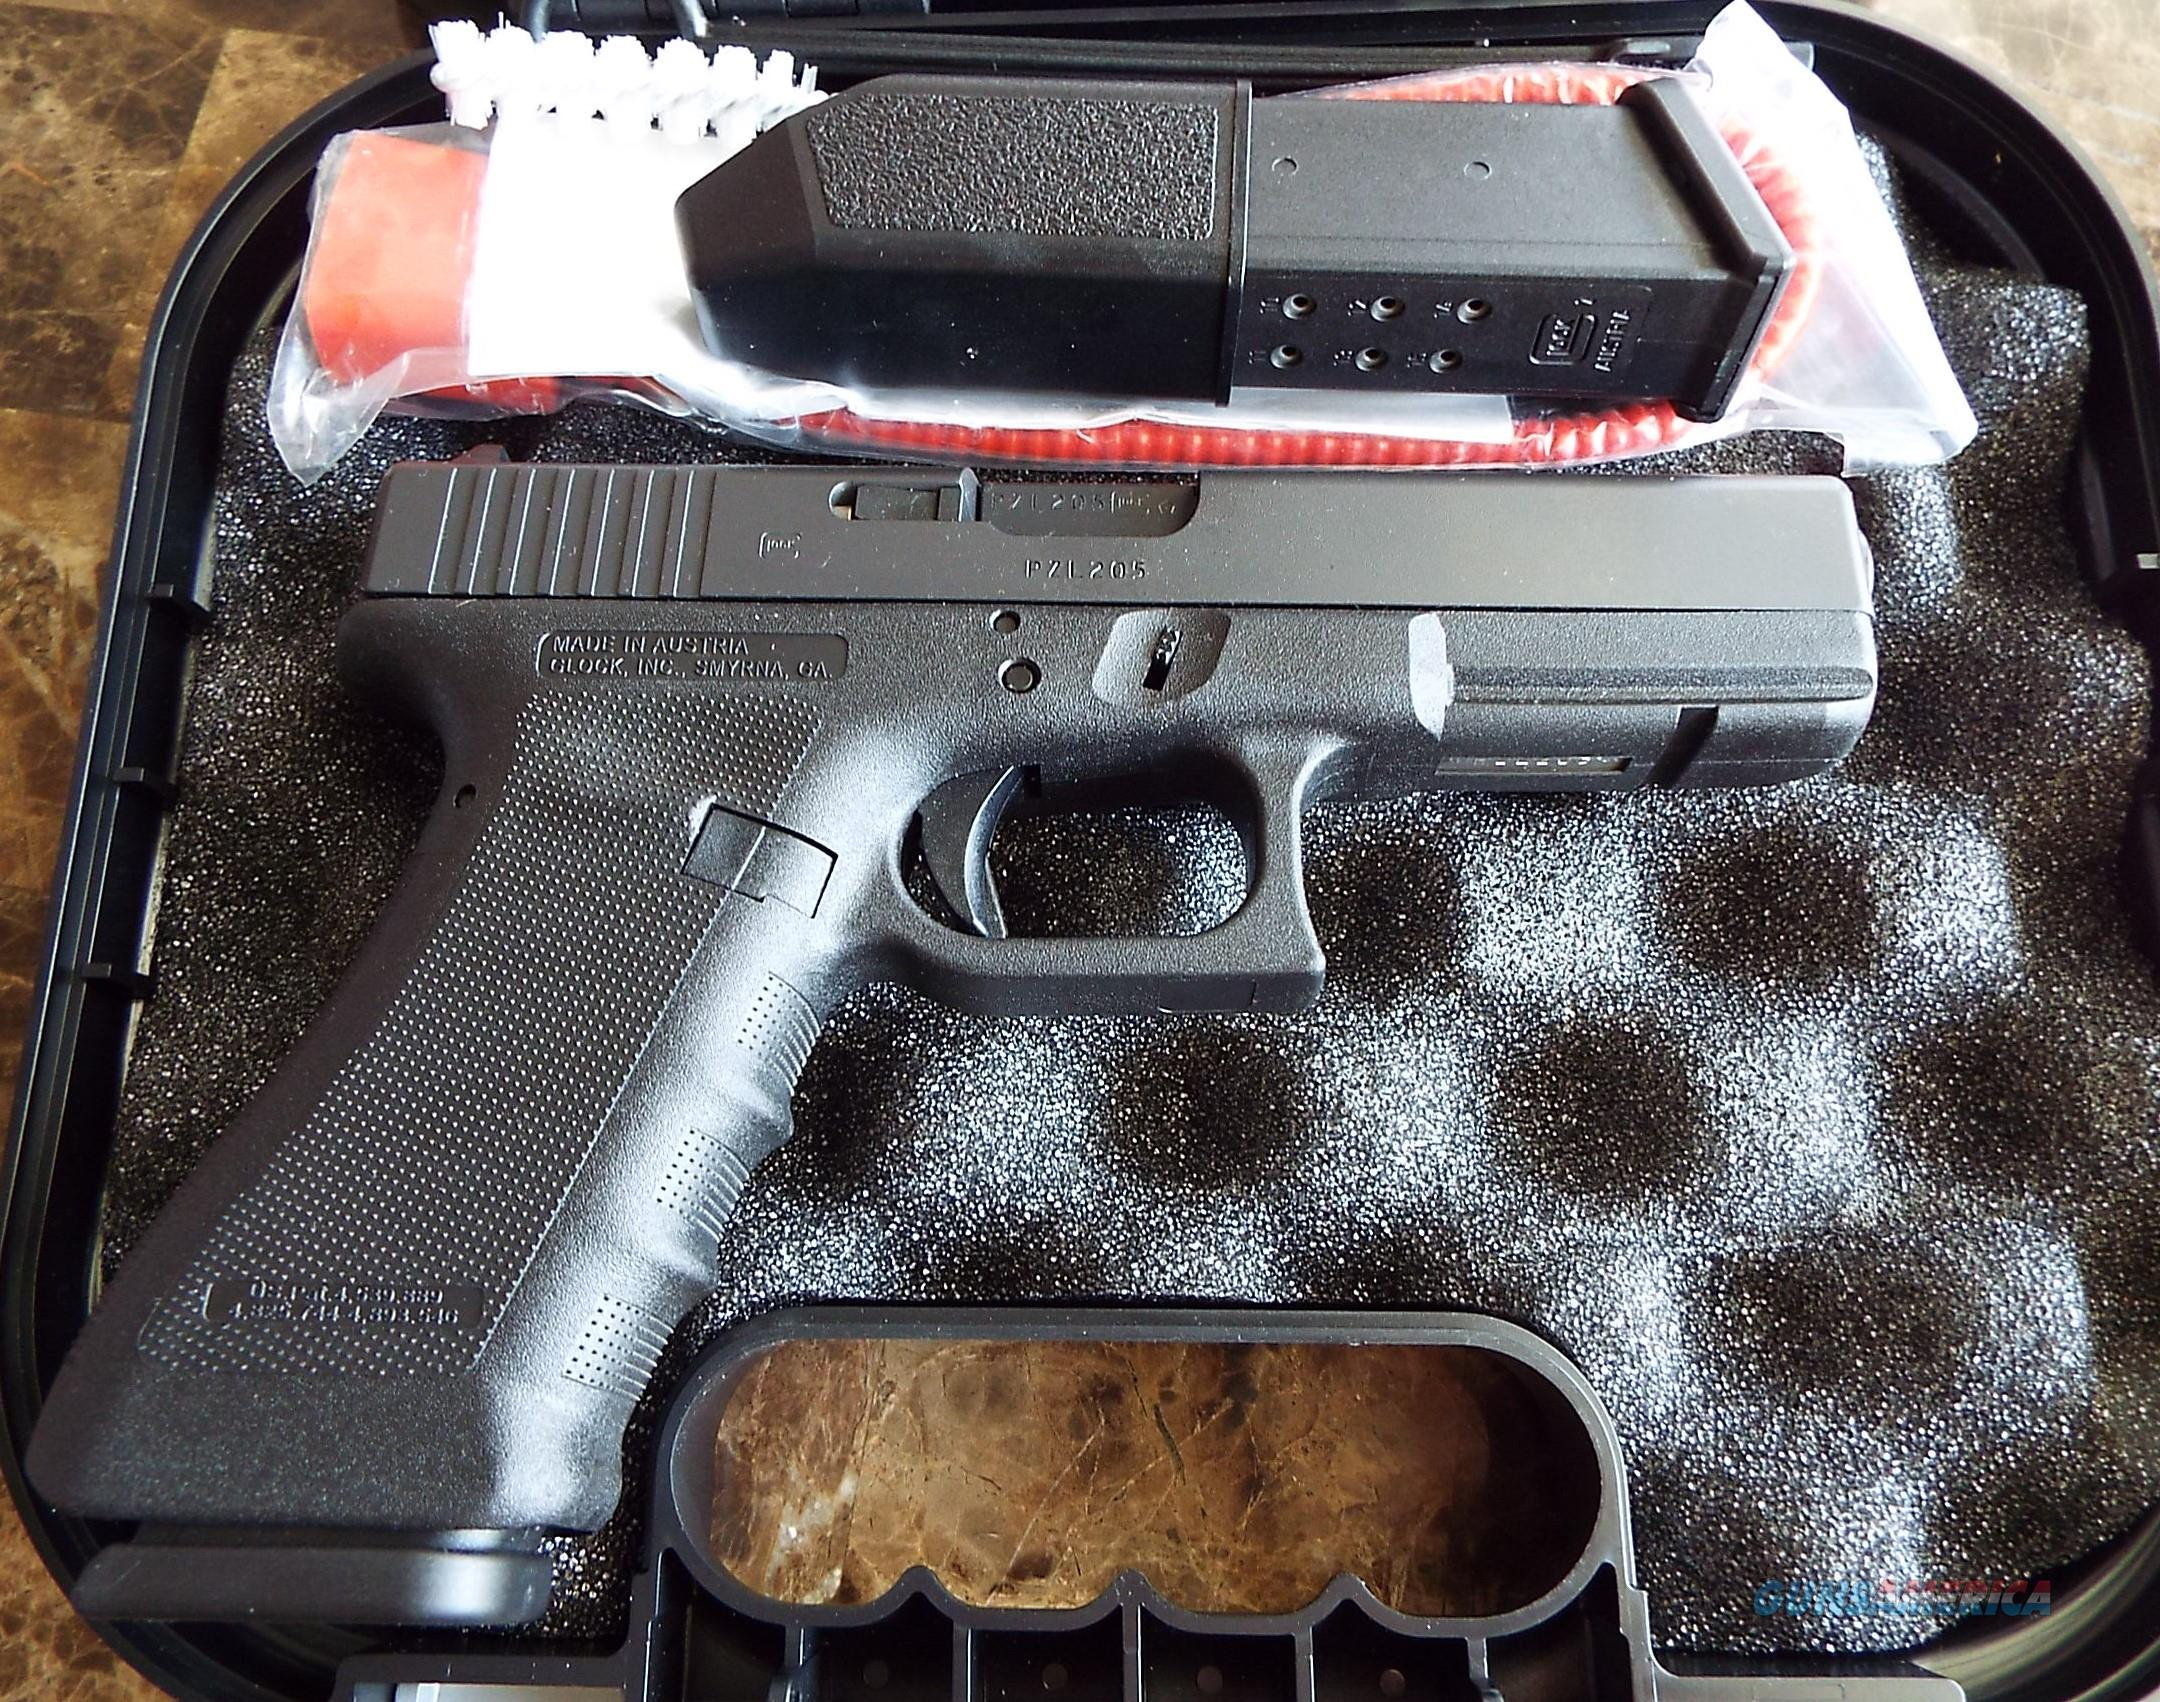 "Glock 22 RTF Gen3 G22  40 S&W 4.48"" 15+1 FS Black  New!   LAYAWAY OPTION  PT2250203  Guns > Pistols > Glock Pistols > 22"